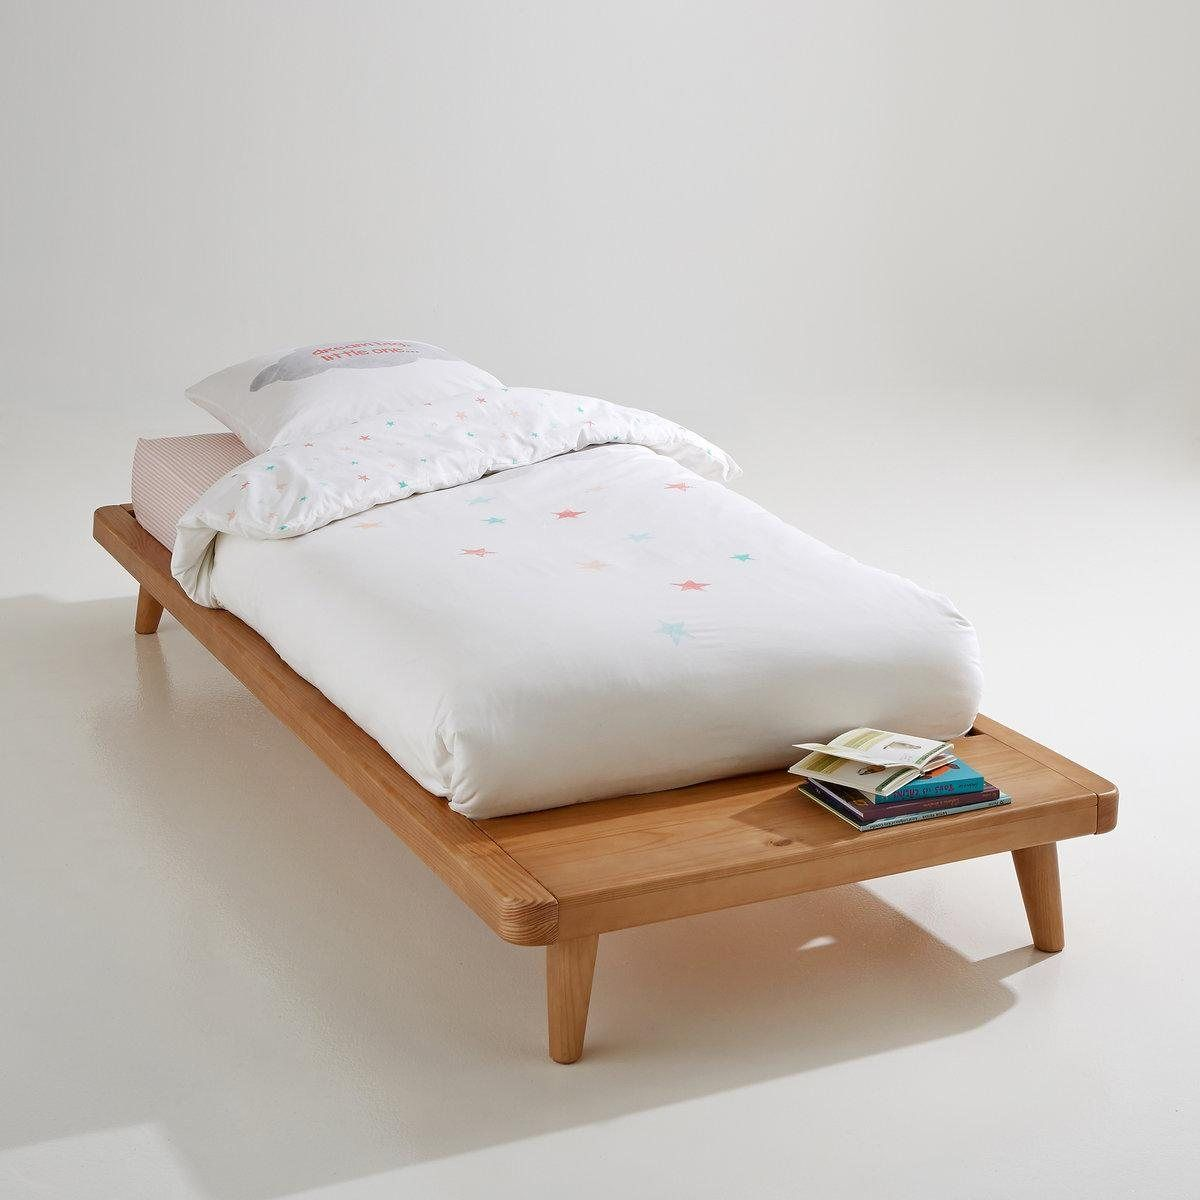 lit enfant style vintage la redoute interieur frenchyfancy 2 frenchy fancy. Black Bedroom Furniture Sets. Home Design Ideas